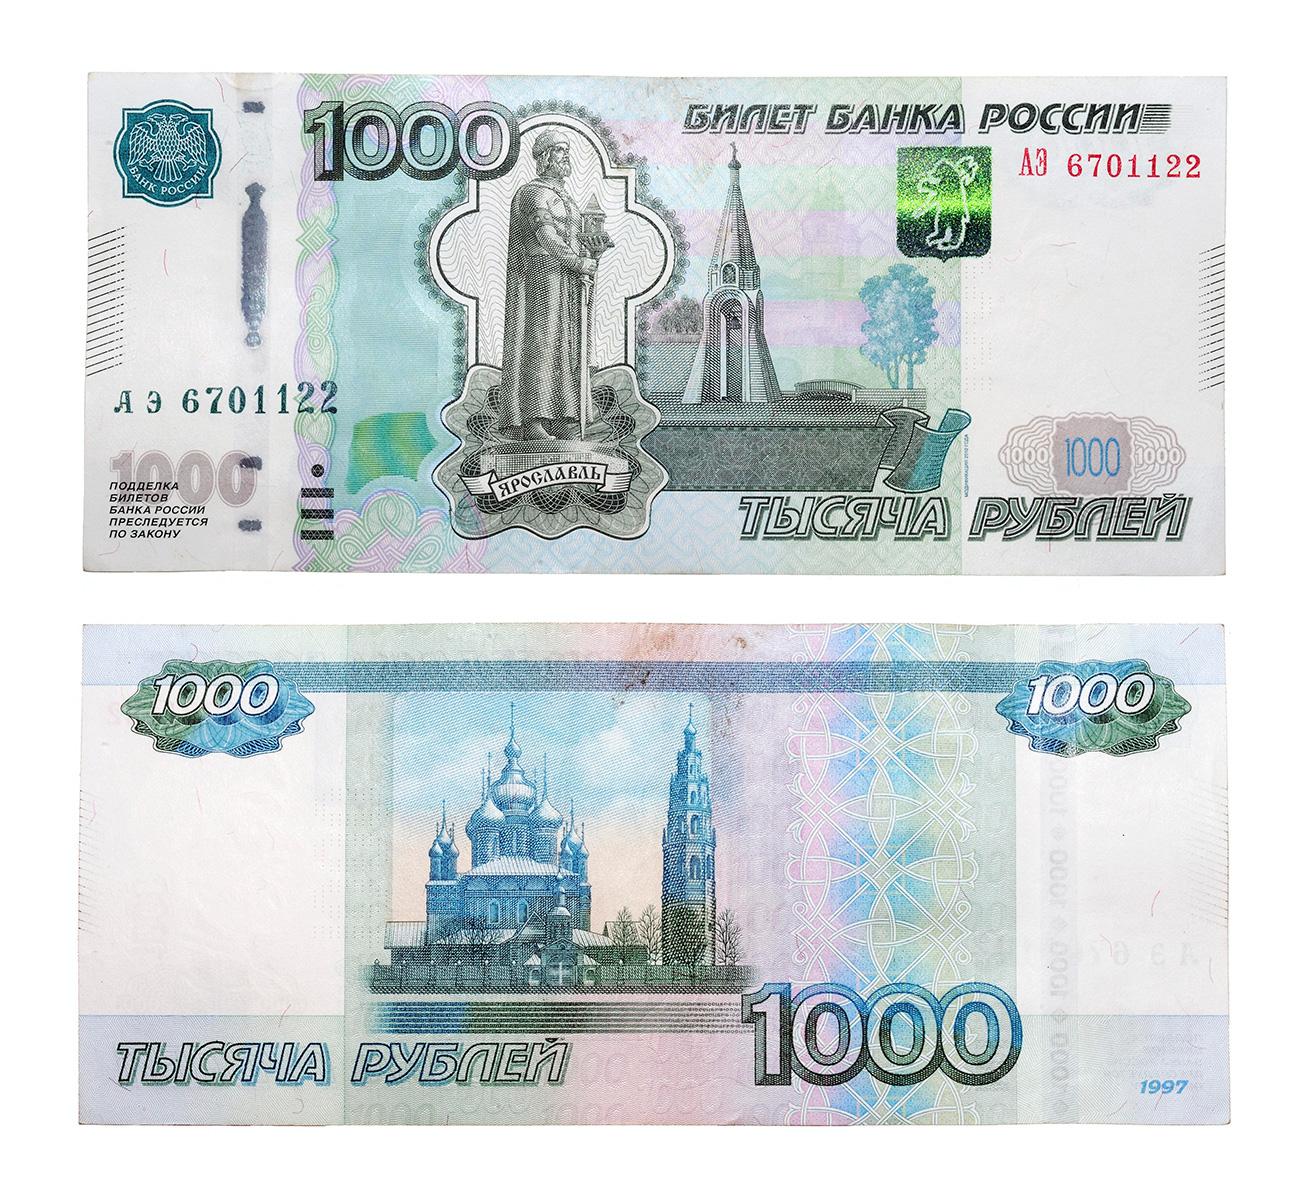 1000 rubles / Global Look Press